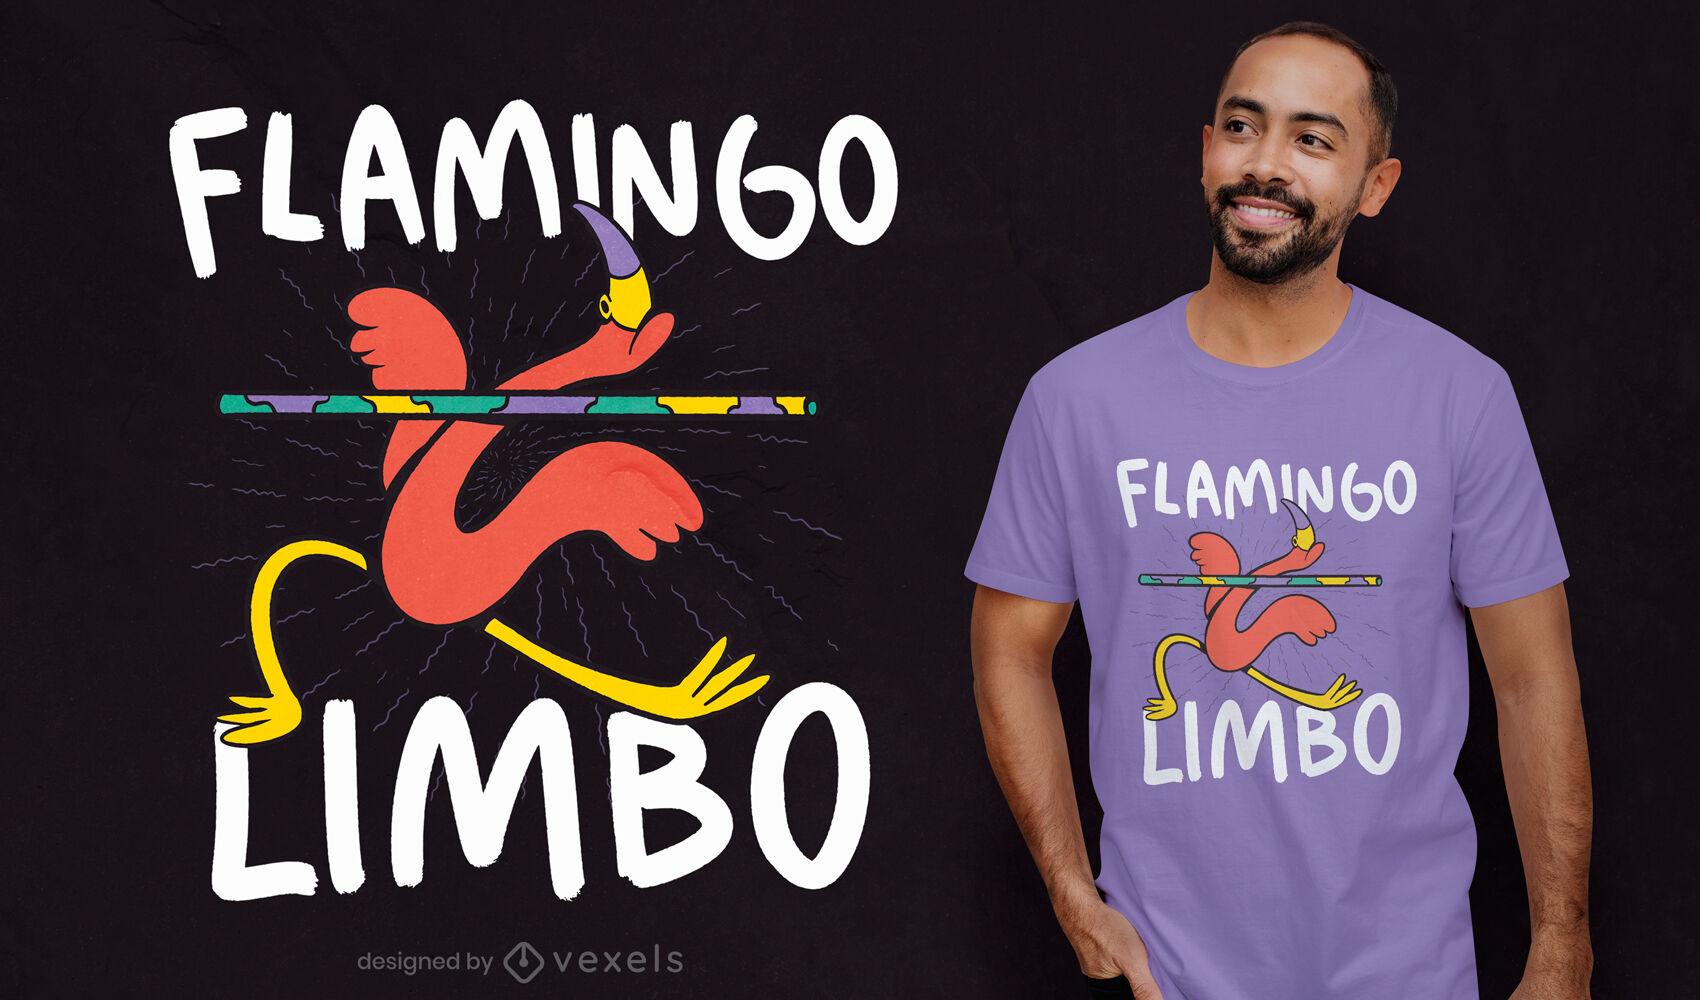 Flamingo limbo dance t-shirt design